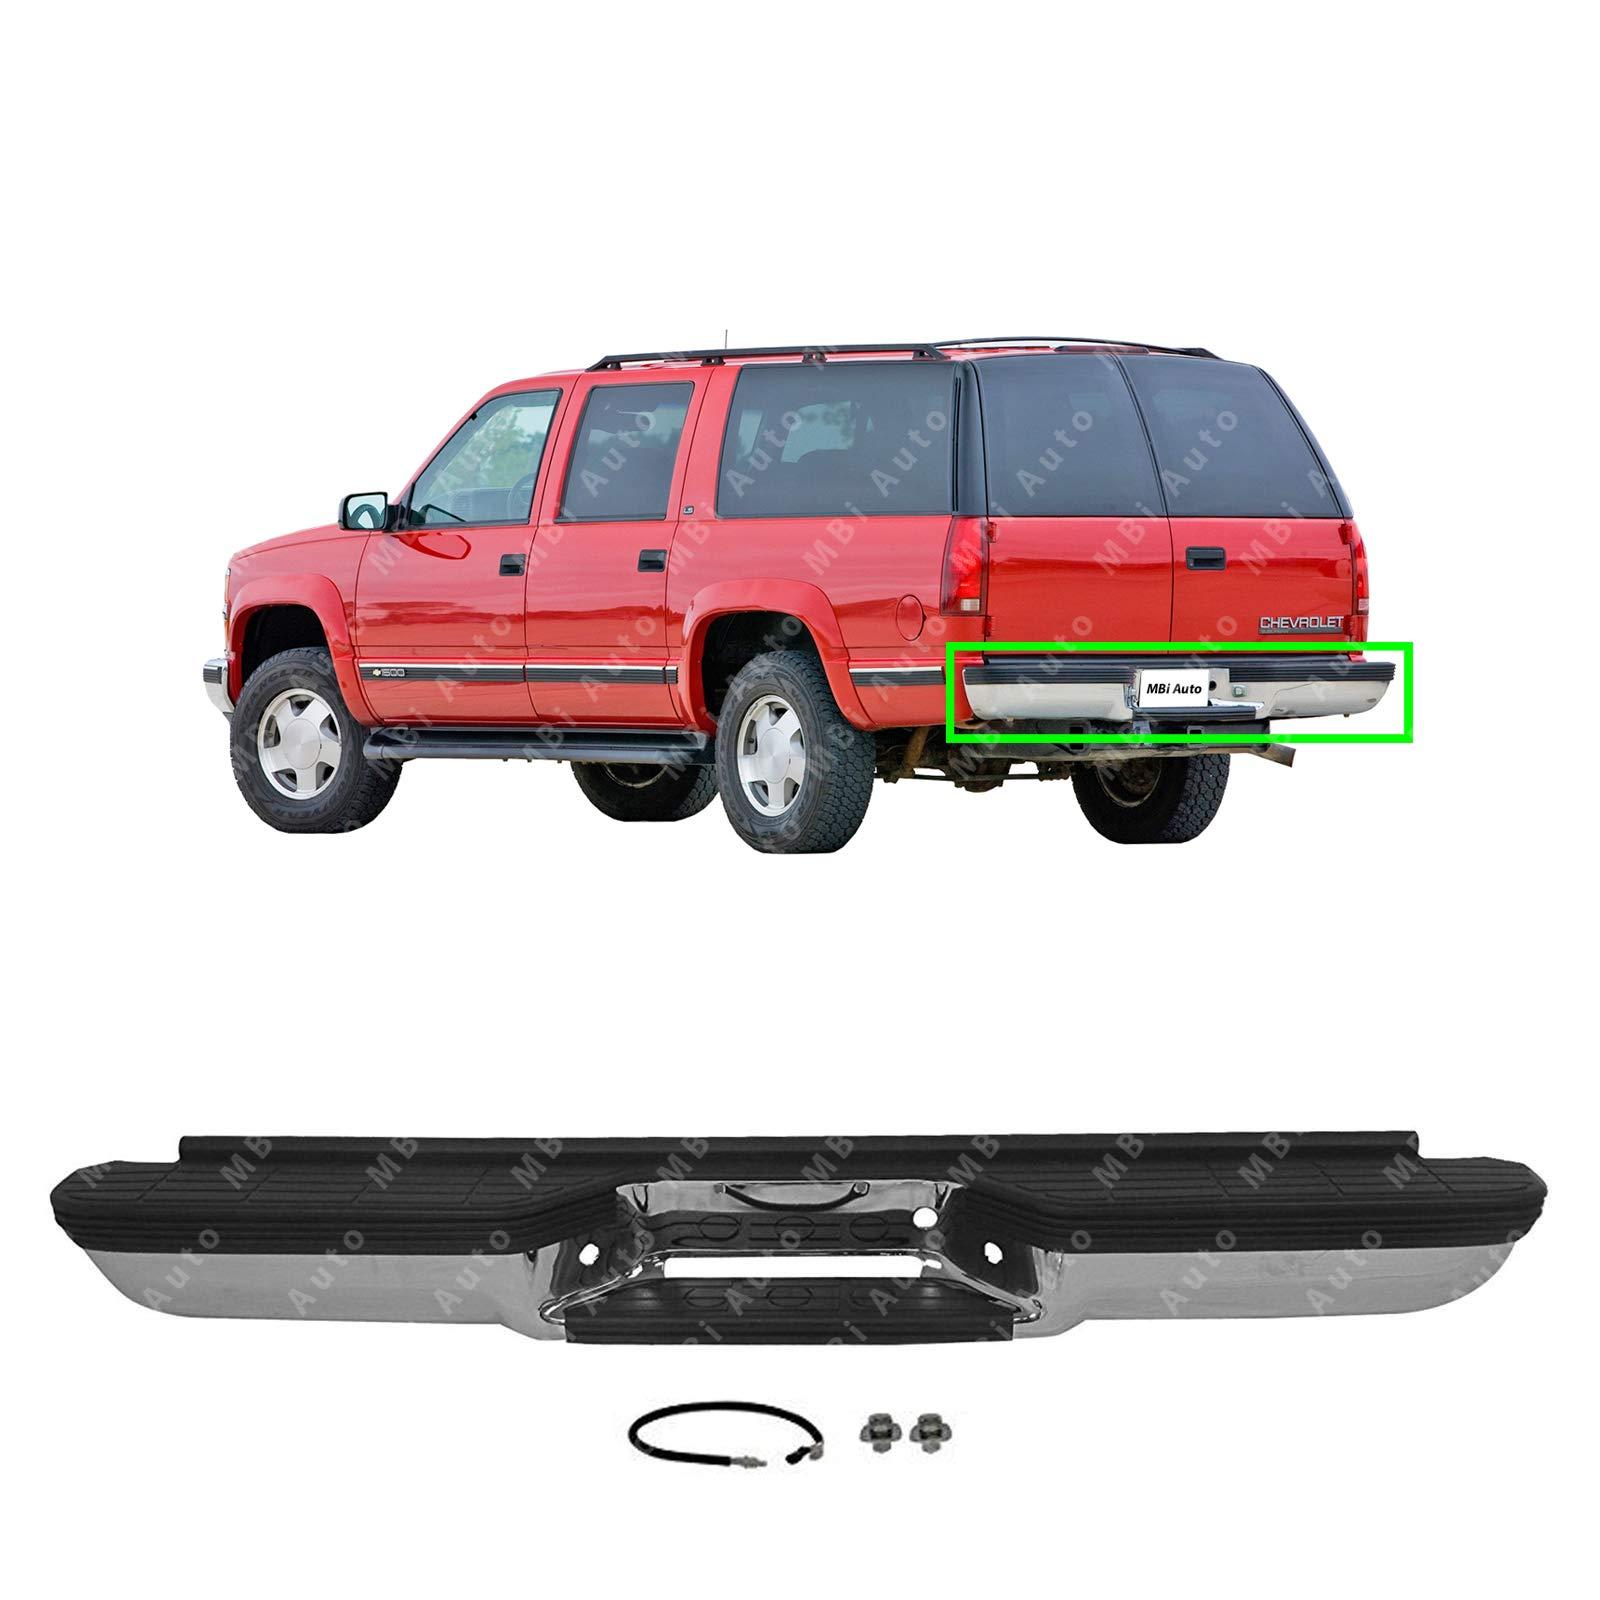 00 chevy suburban amazon com 00 06 Yukon Wheels mbi auto chrome, steel rear bumper direct fit for 1992 2000 chevy suburban